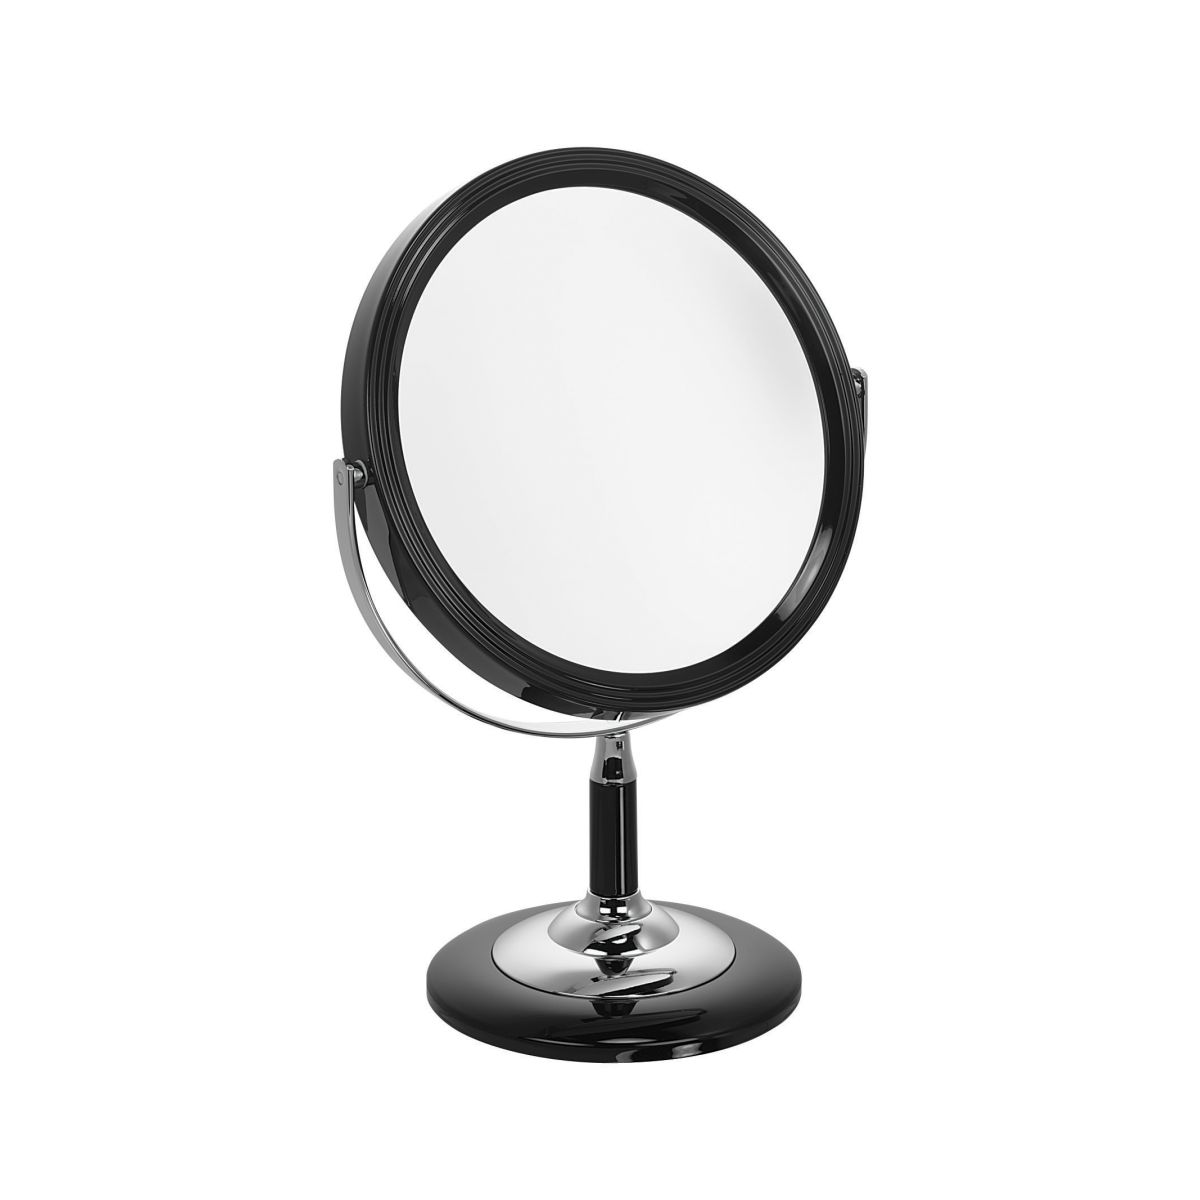 5802 18 blk 2 - Jet' Black 5x Magnification Mirror- 5802/18B